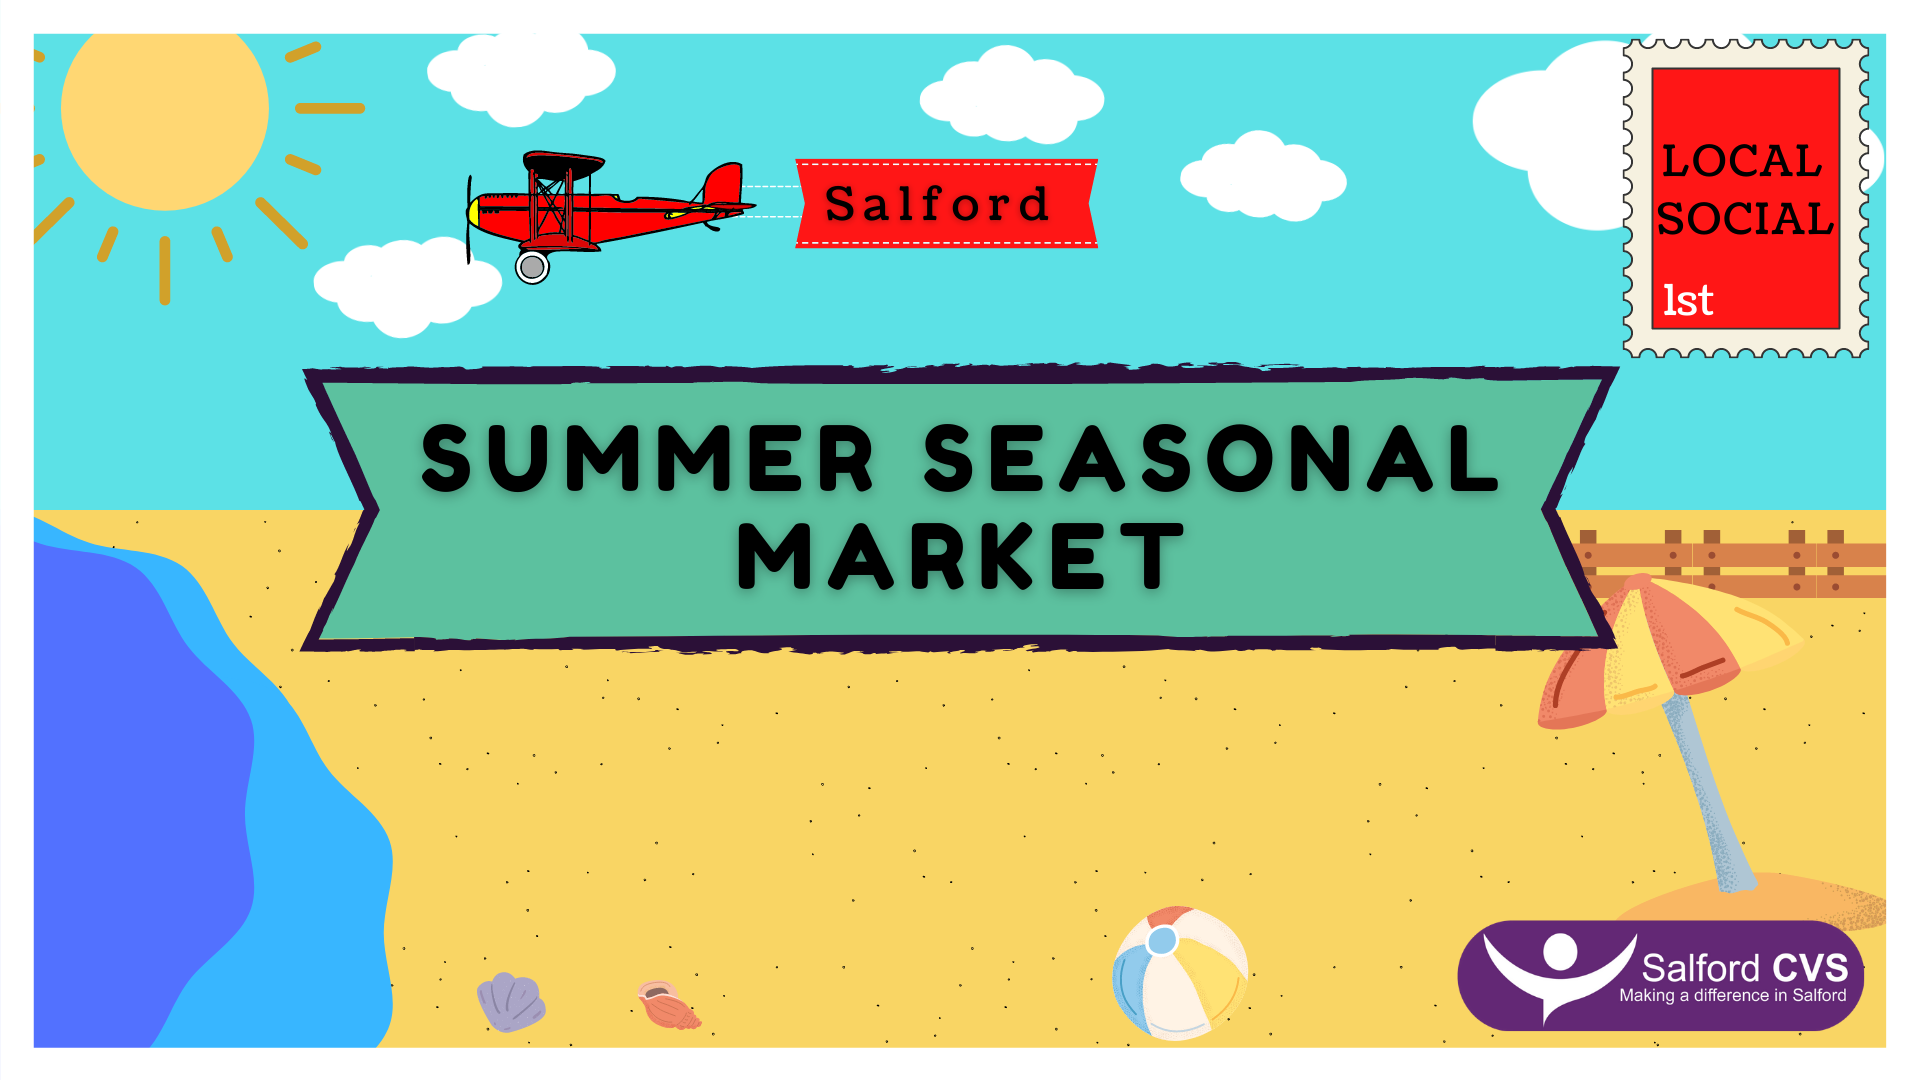 Salford Summer Seasonal Market